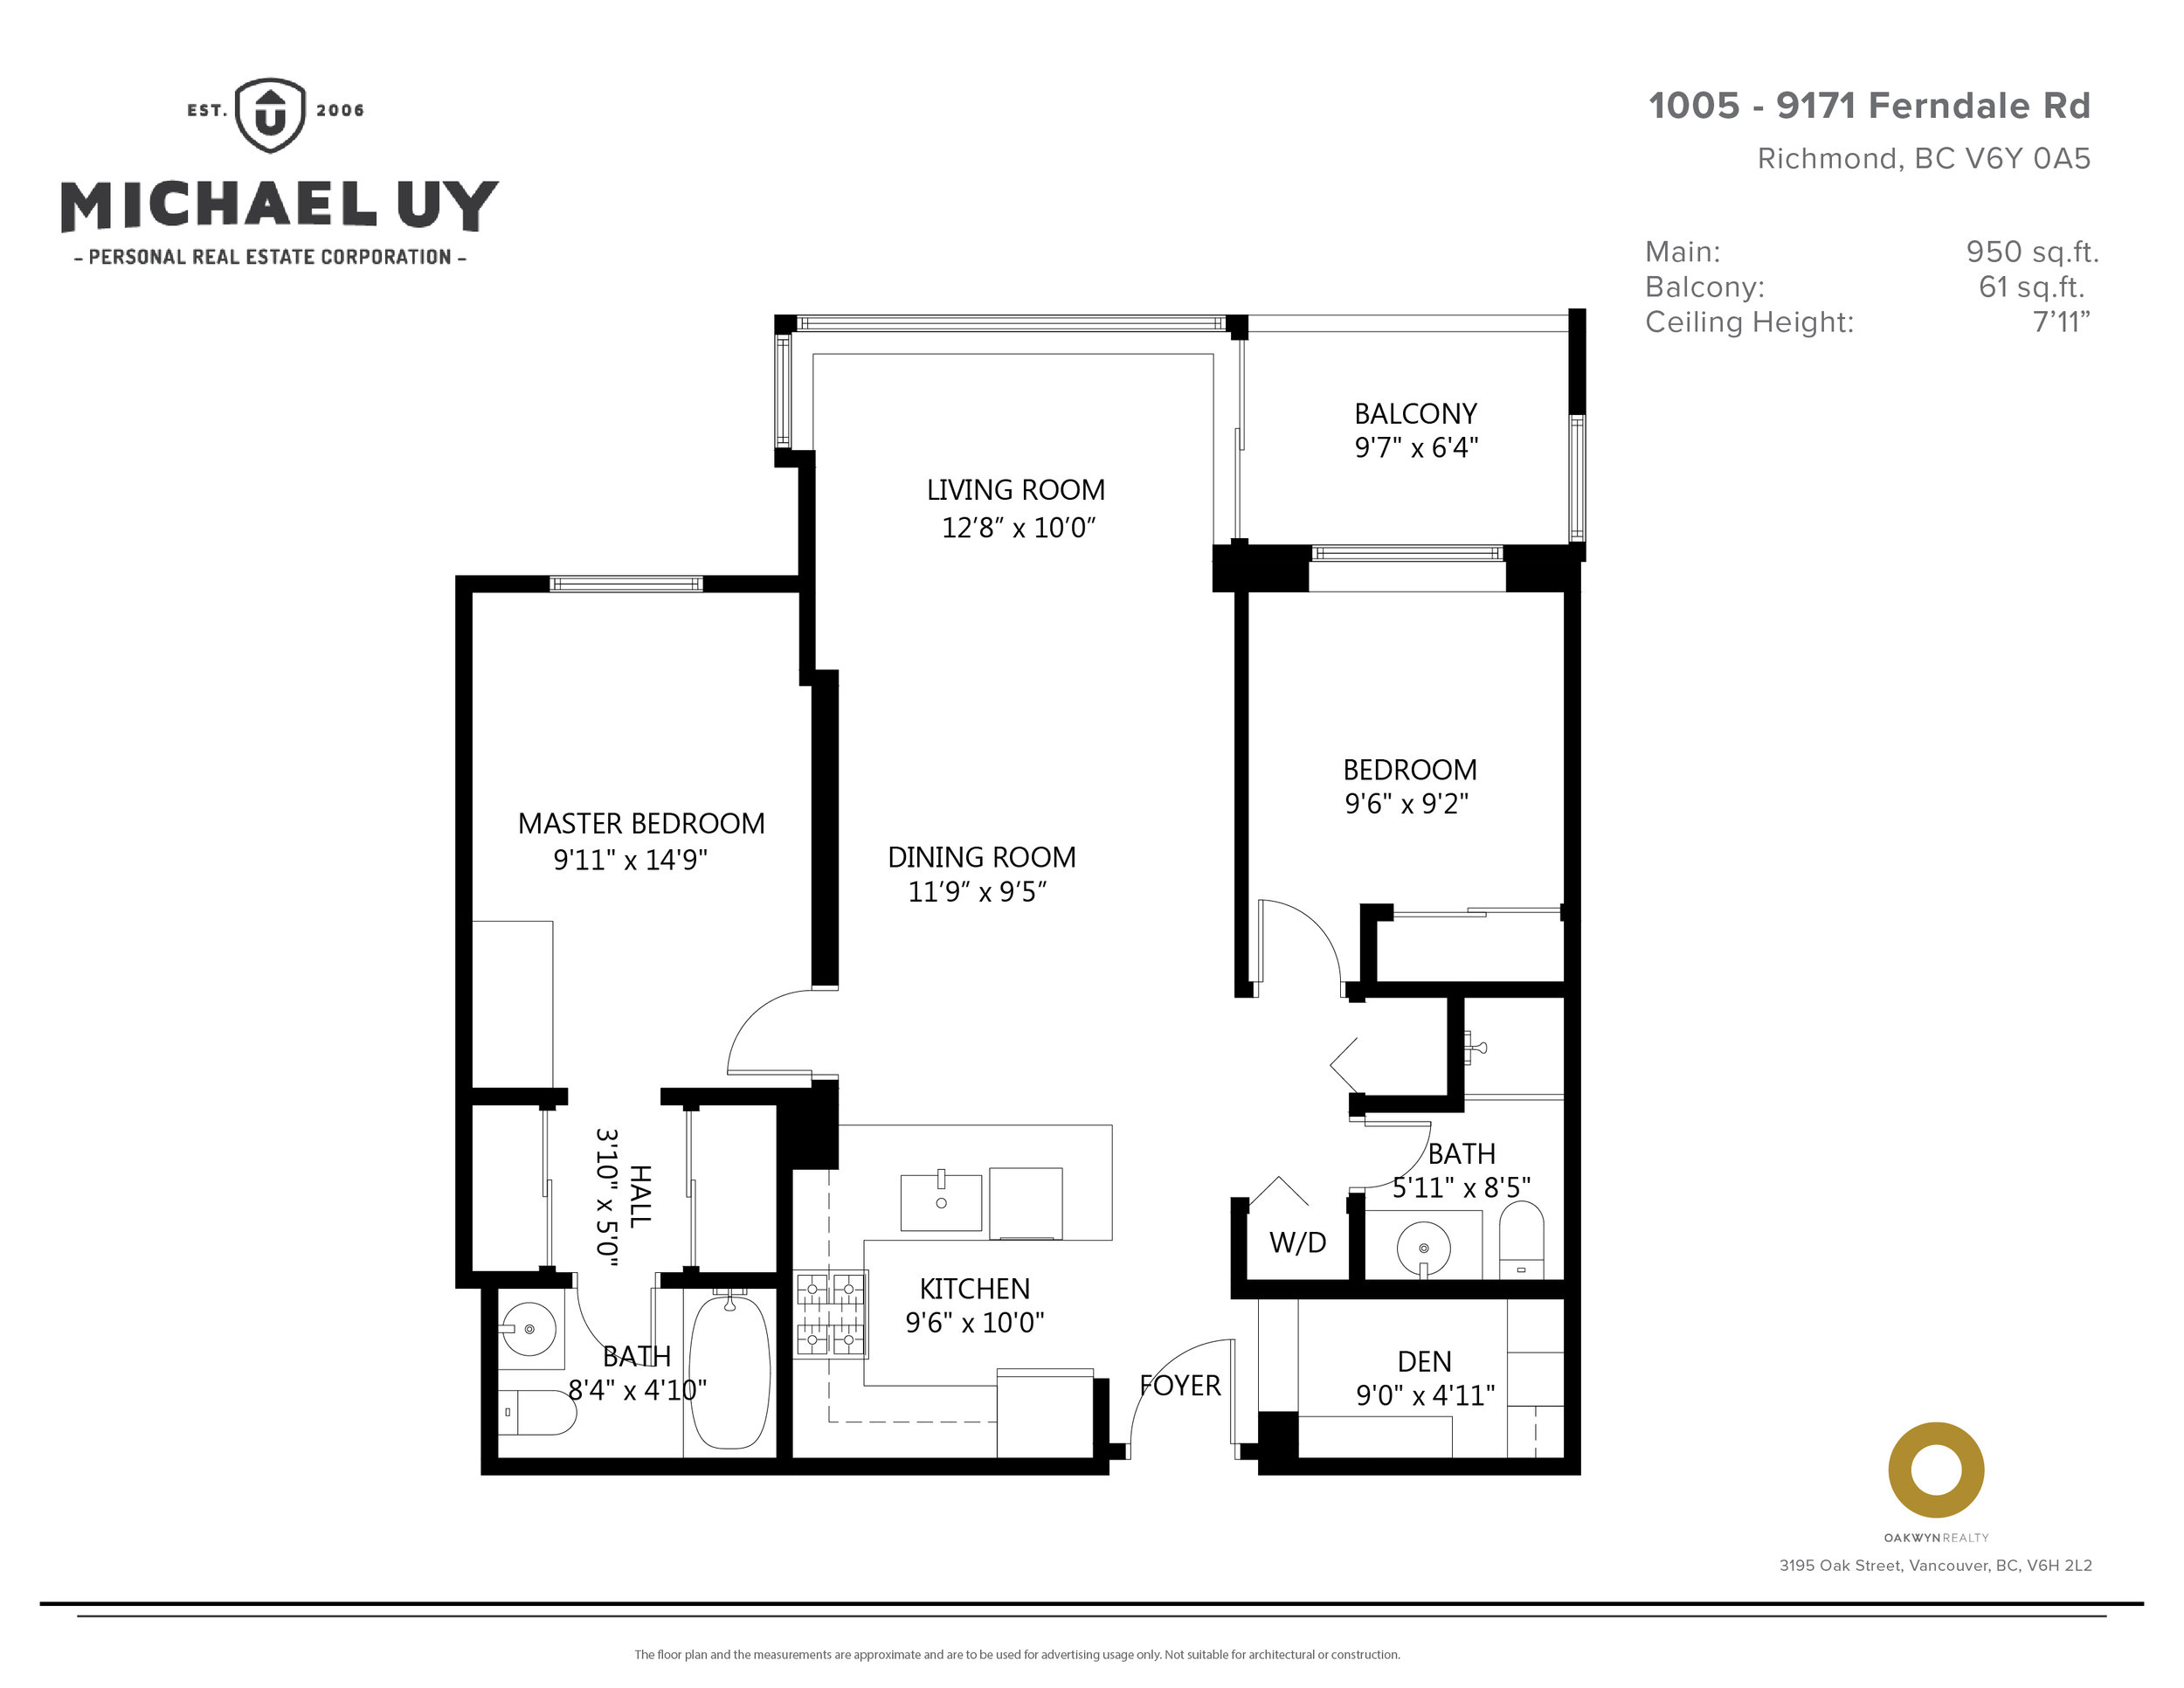 1005-9171 Ferndale Rd - Branded Floor Plan .jpg